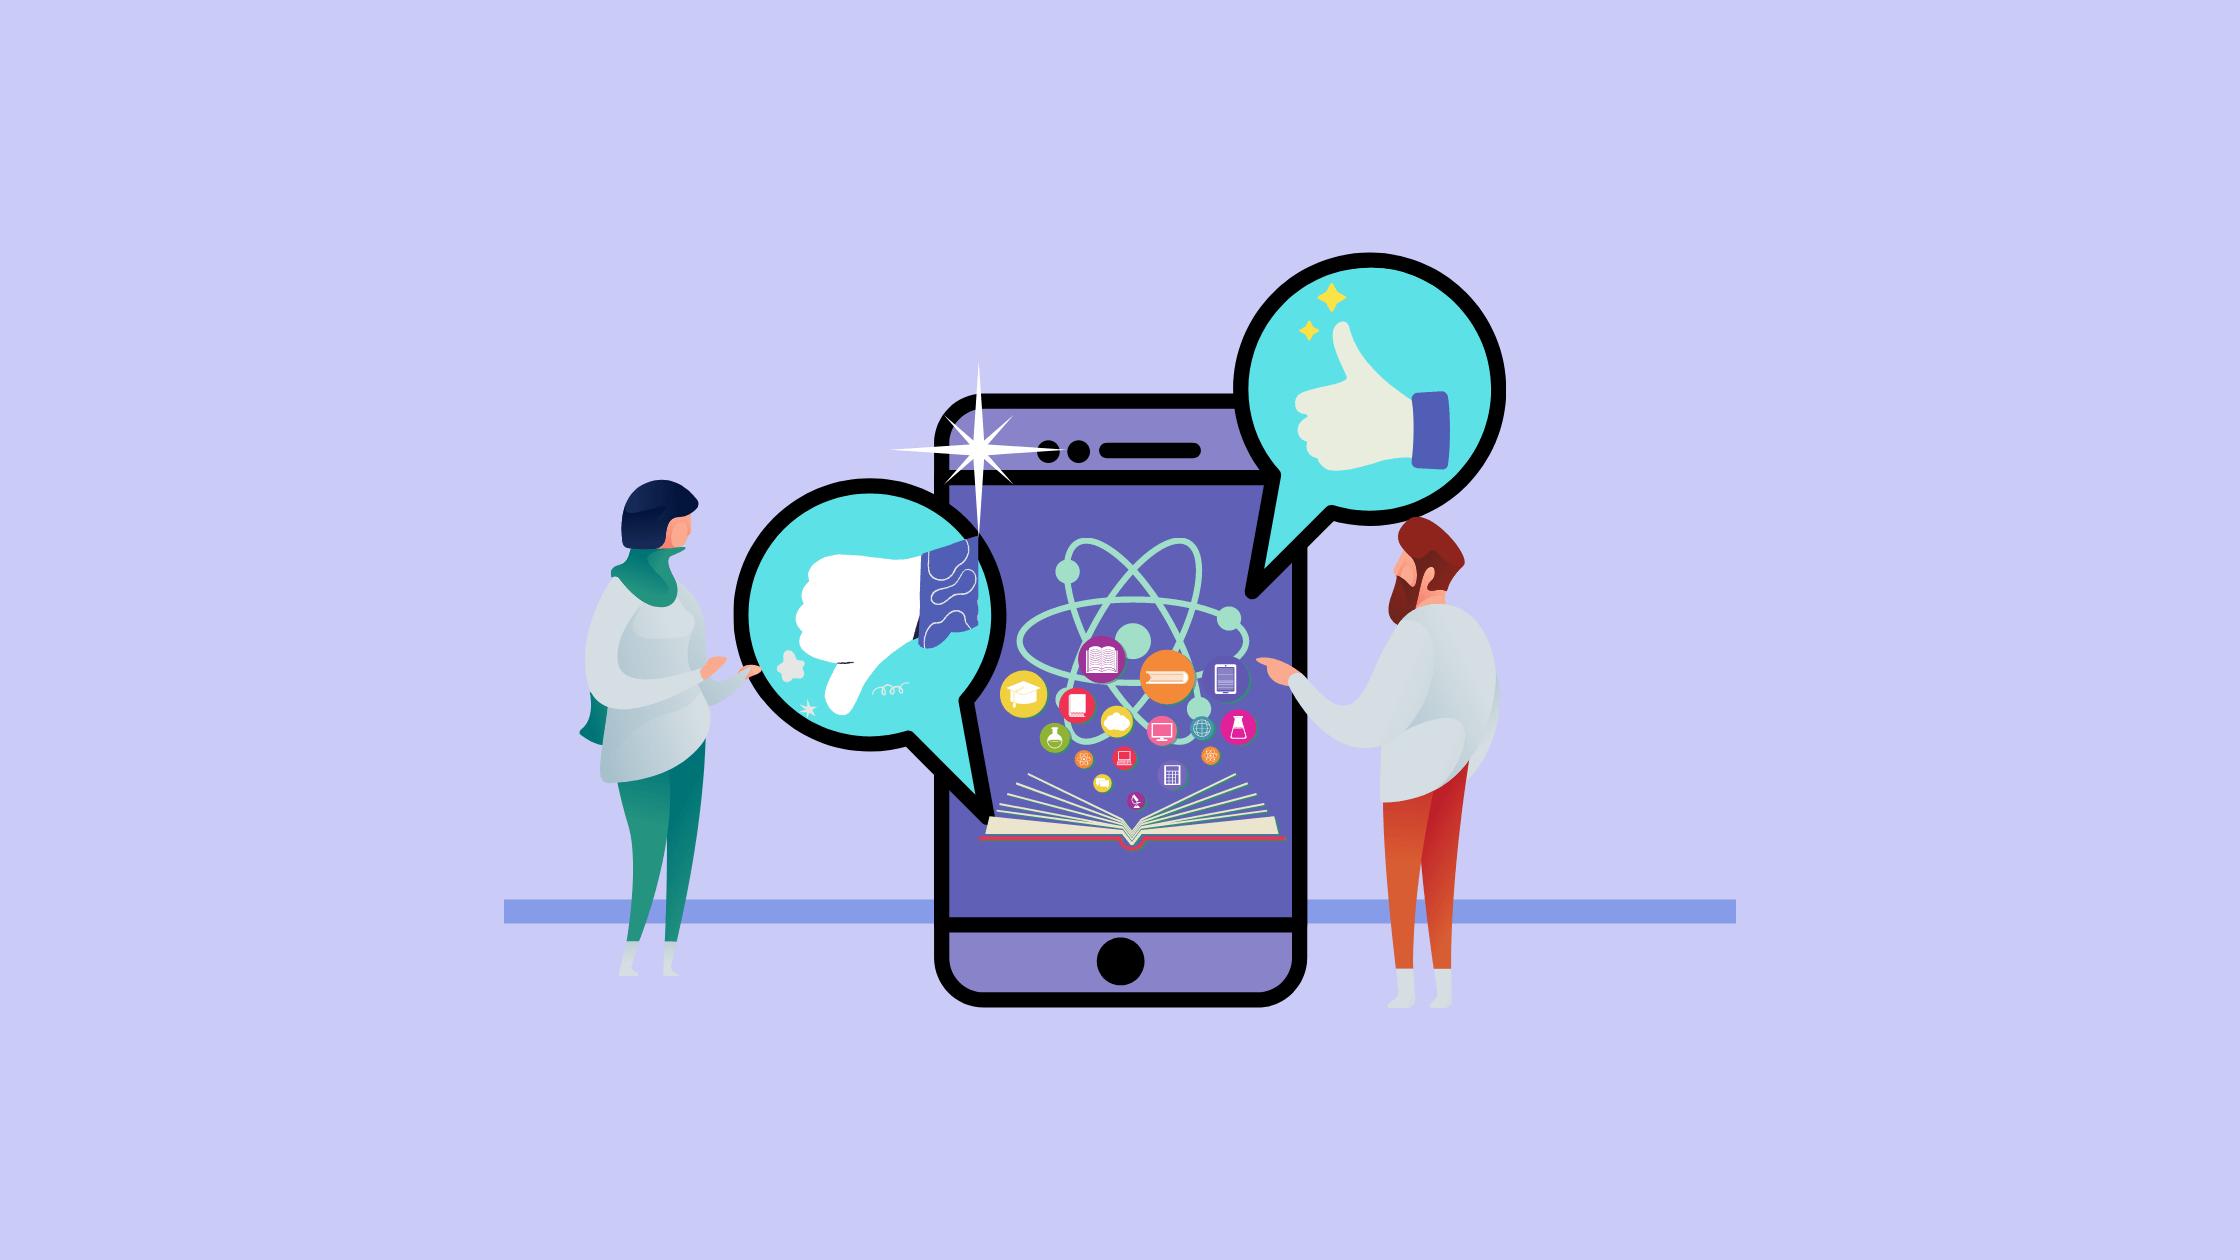 e-learning ventajas y desventajas